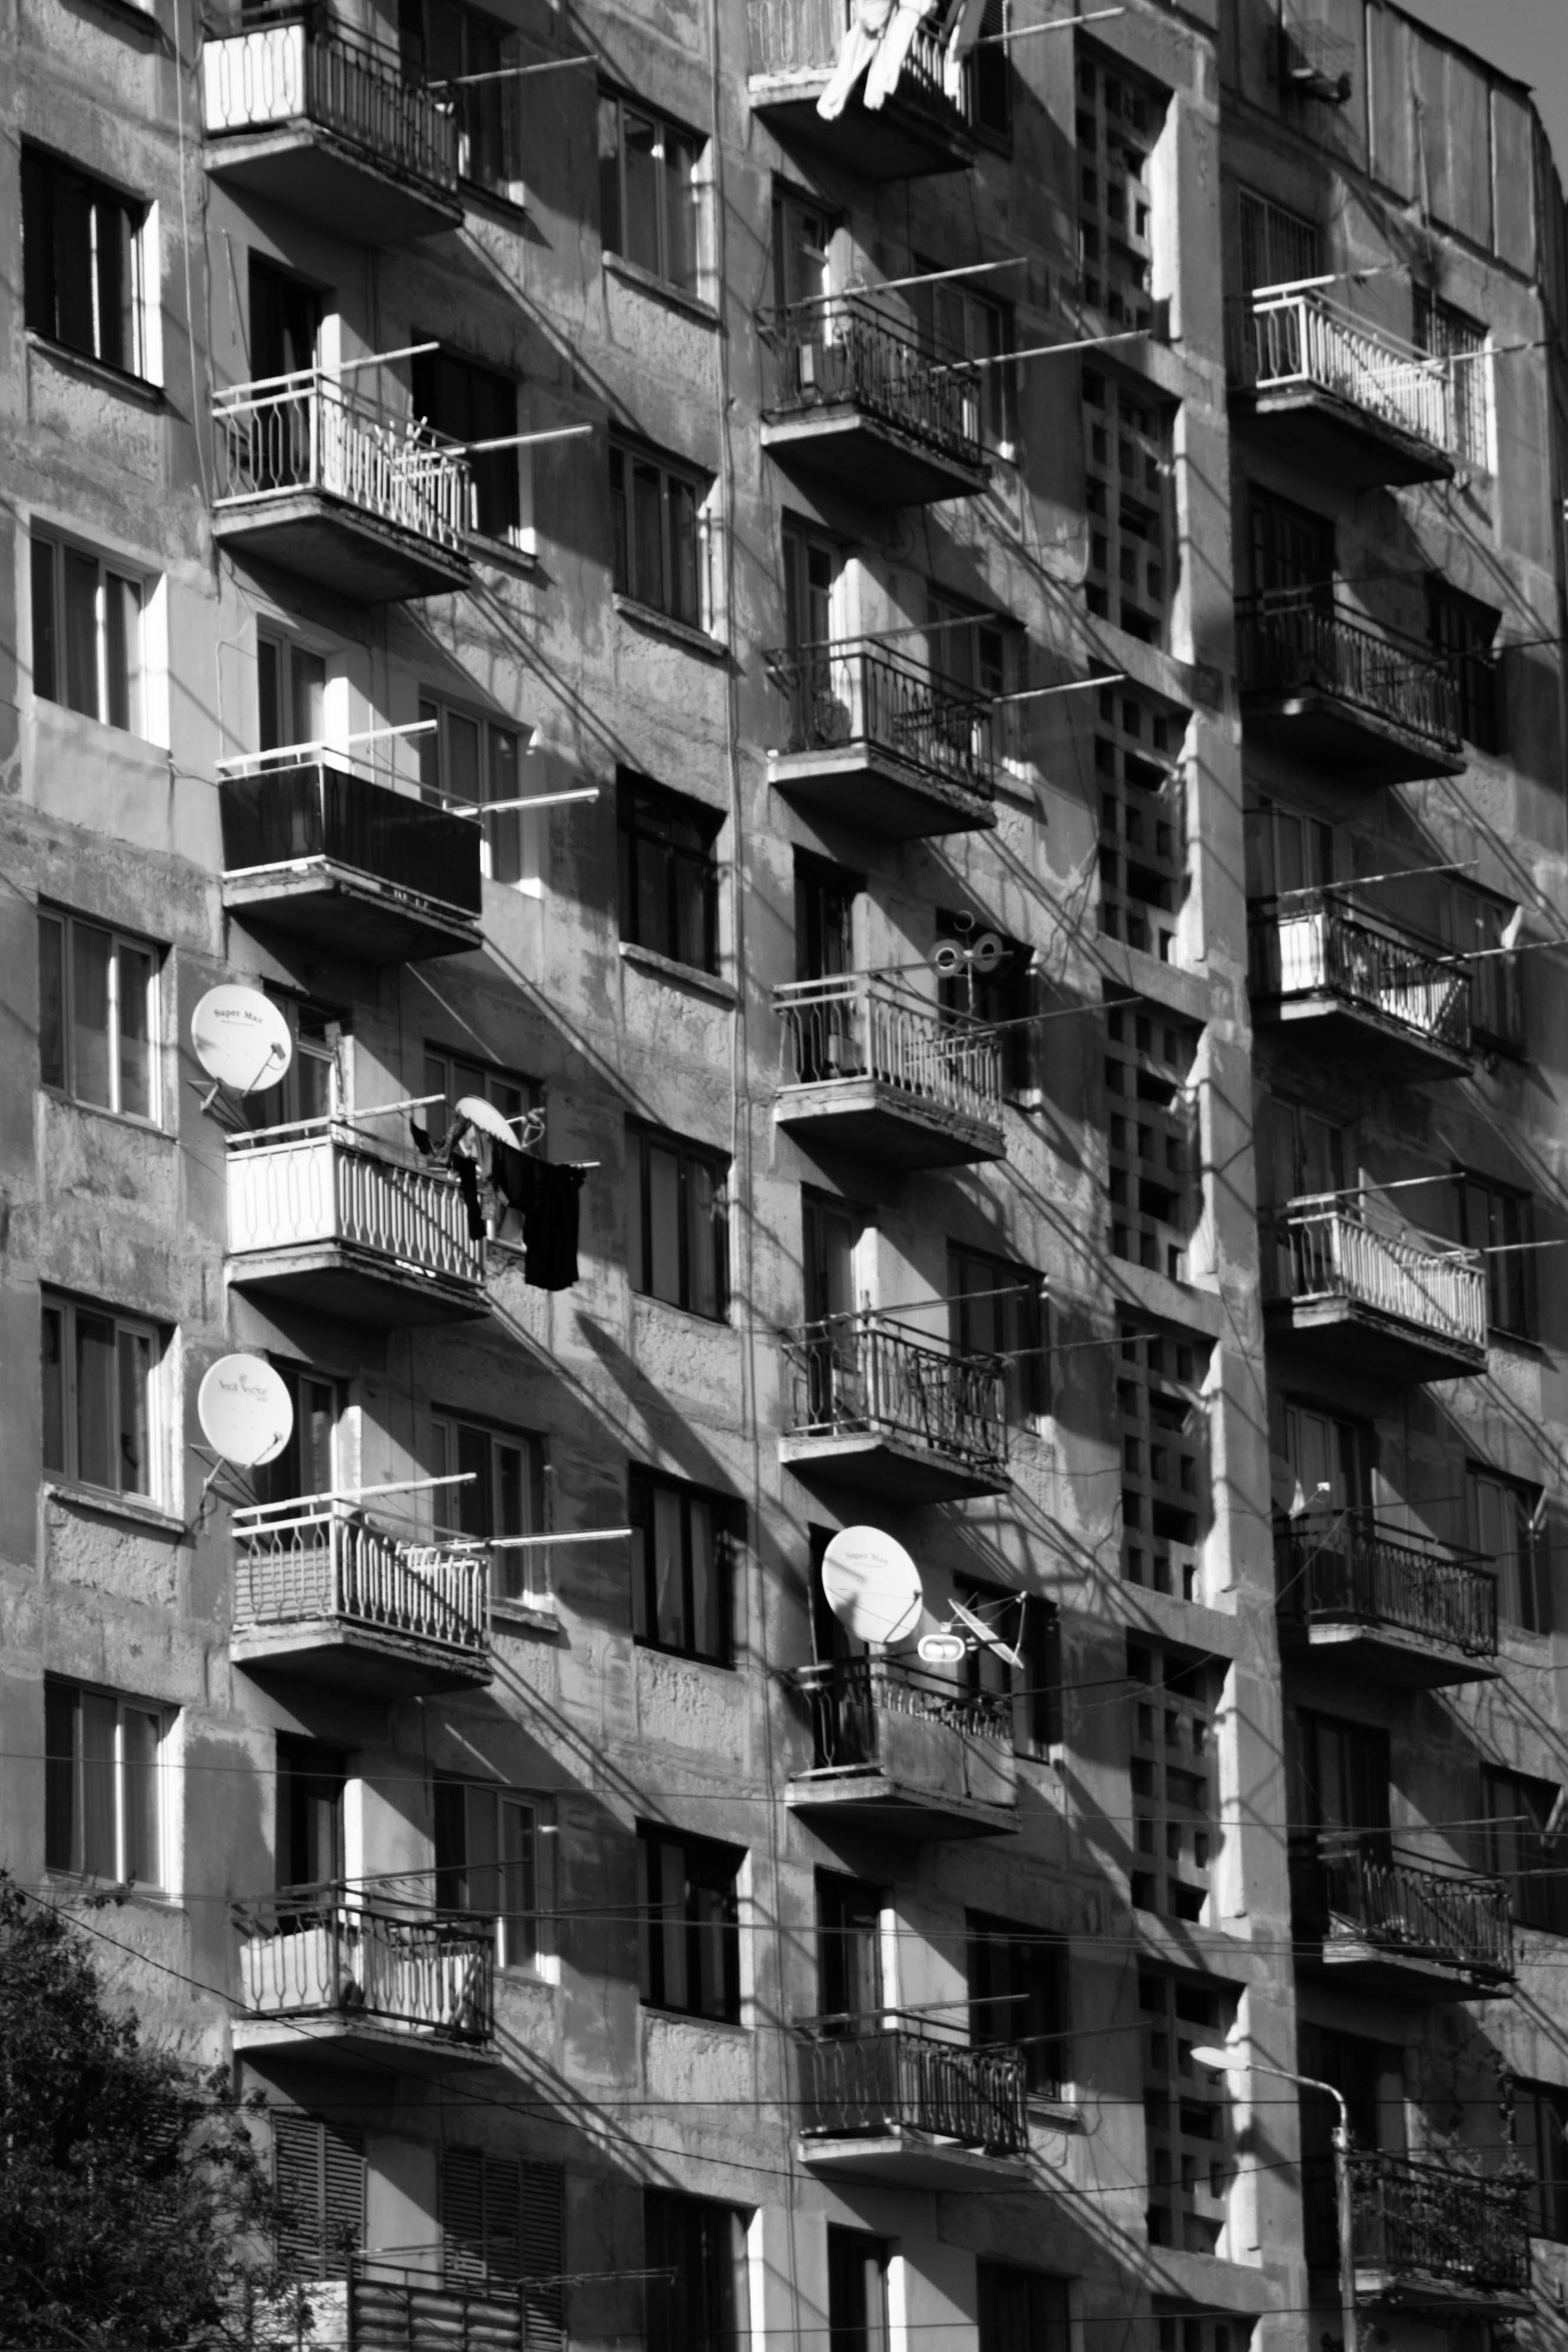 Free stock photo of balconies, shadows, urban